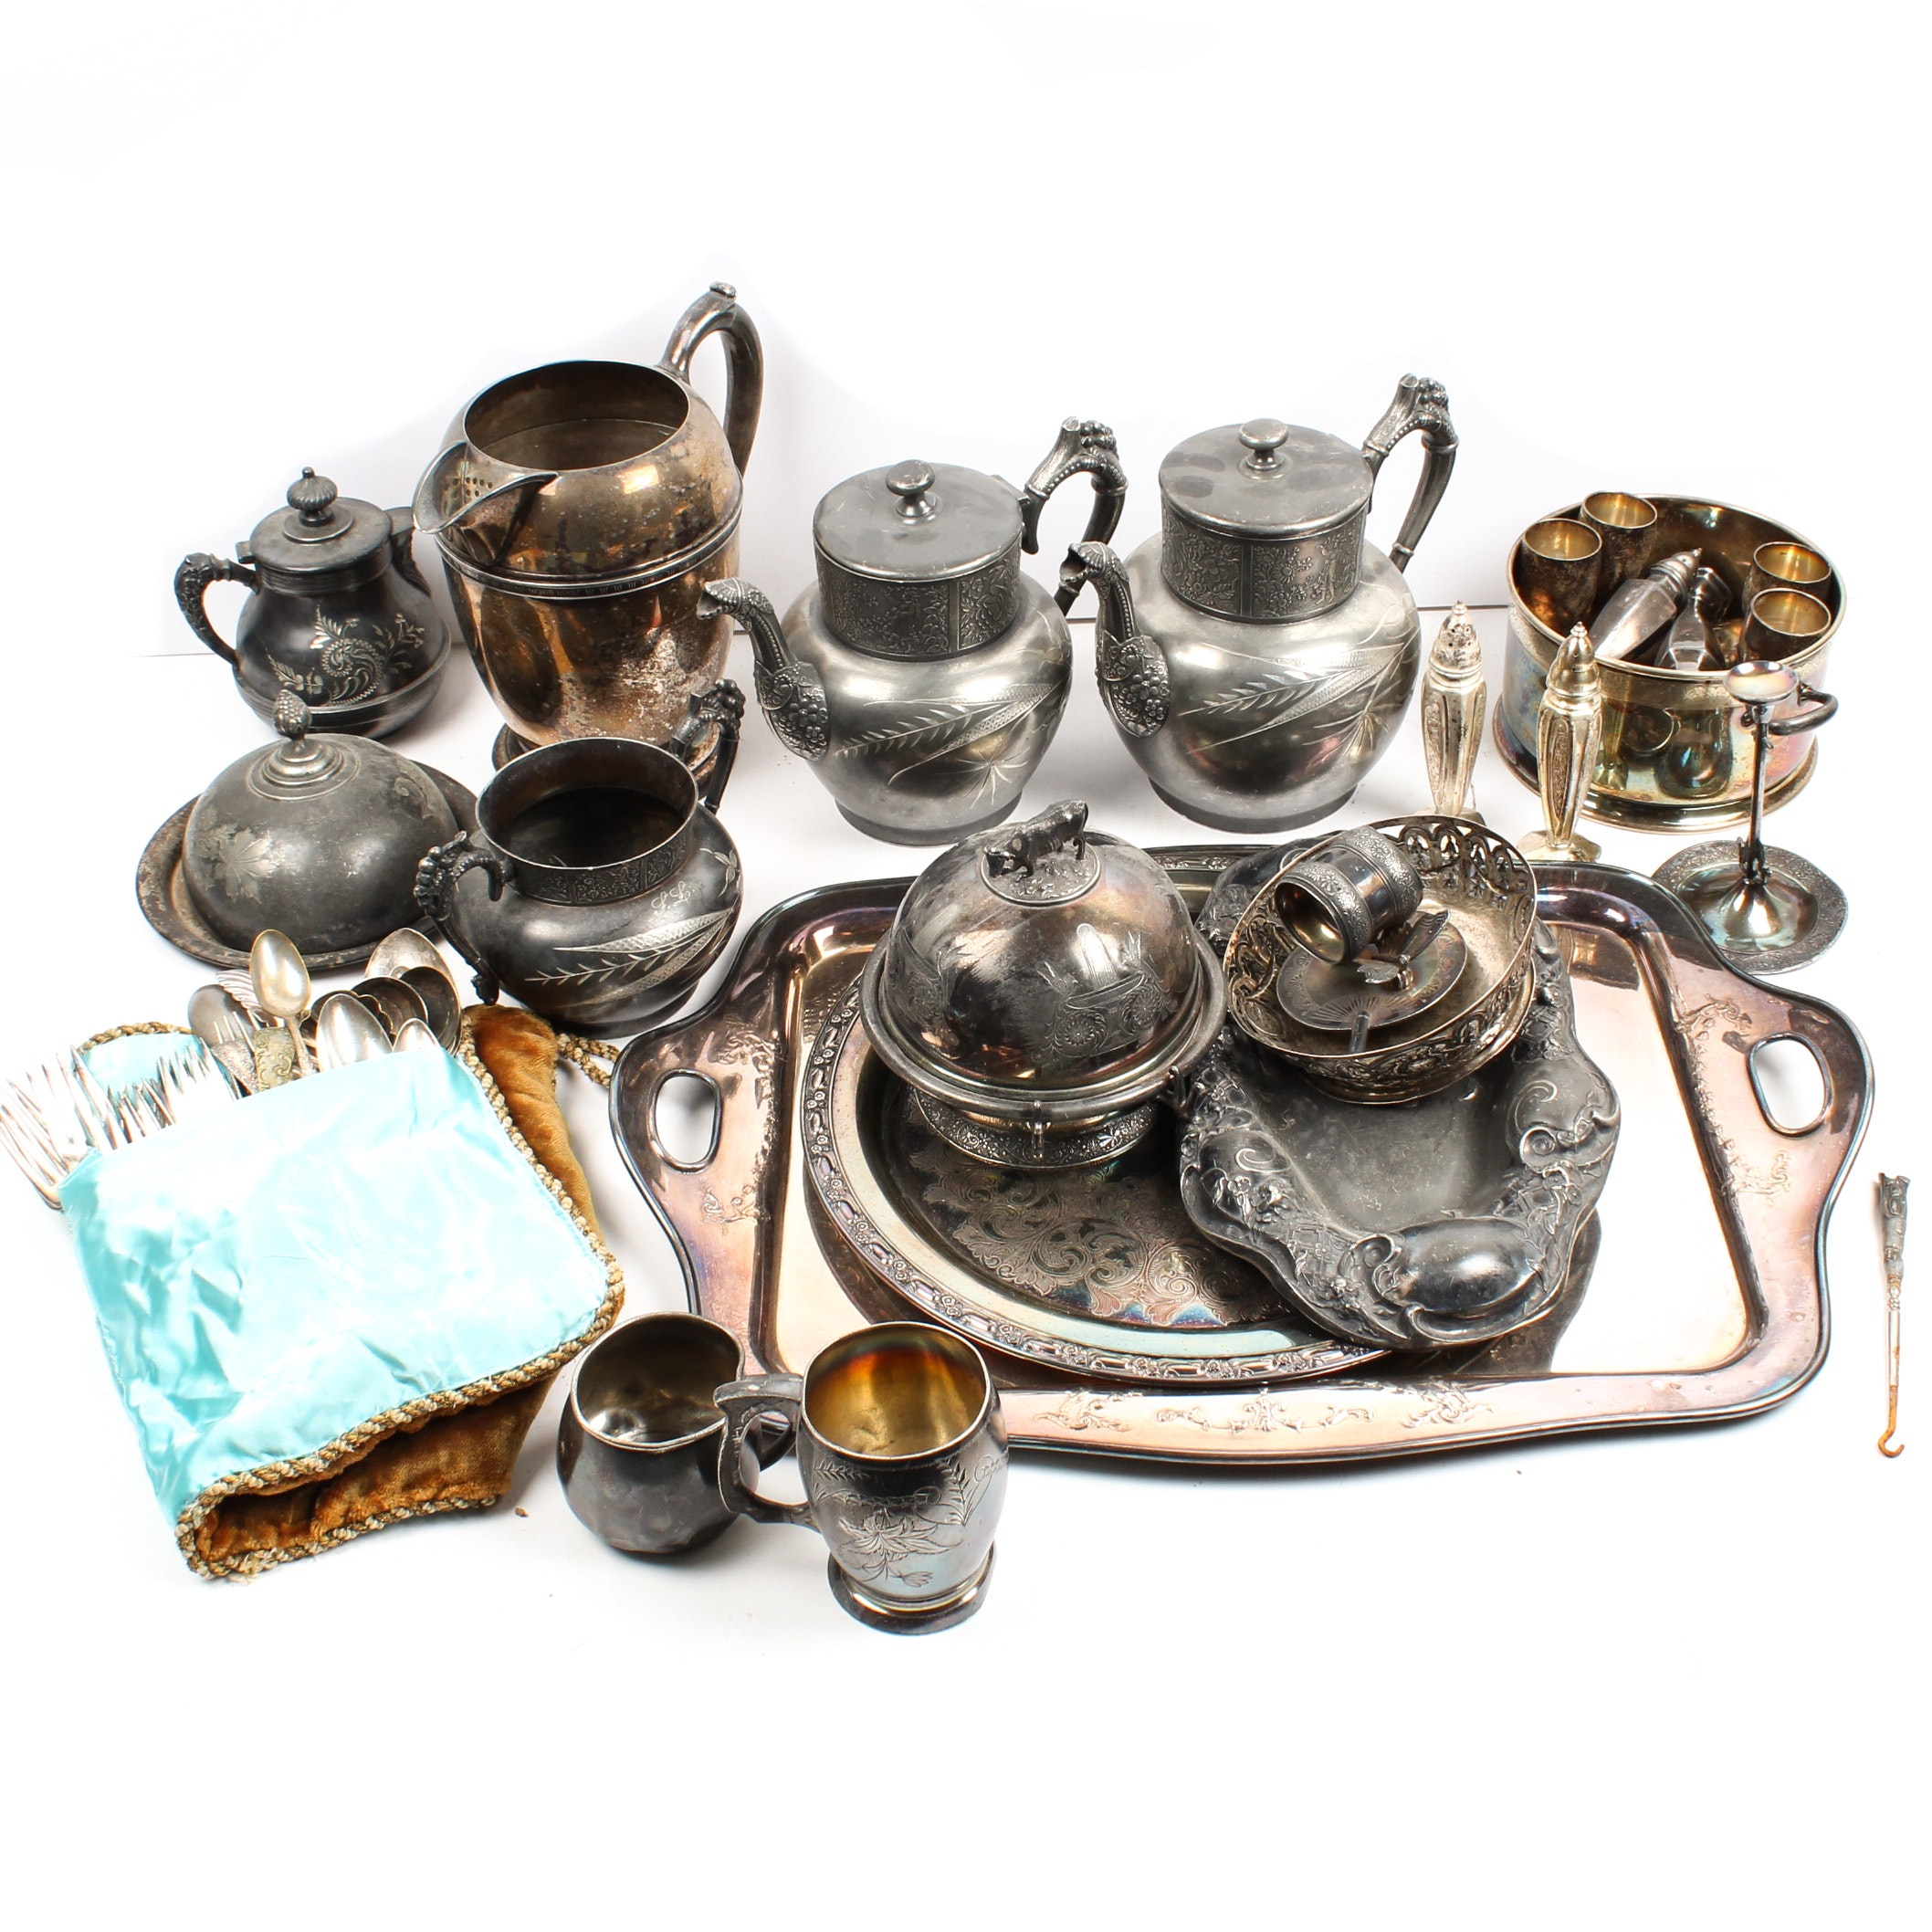 Silver Plate Tableware, Flatware, and Serveware